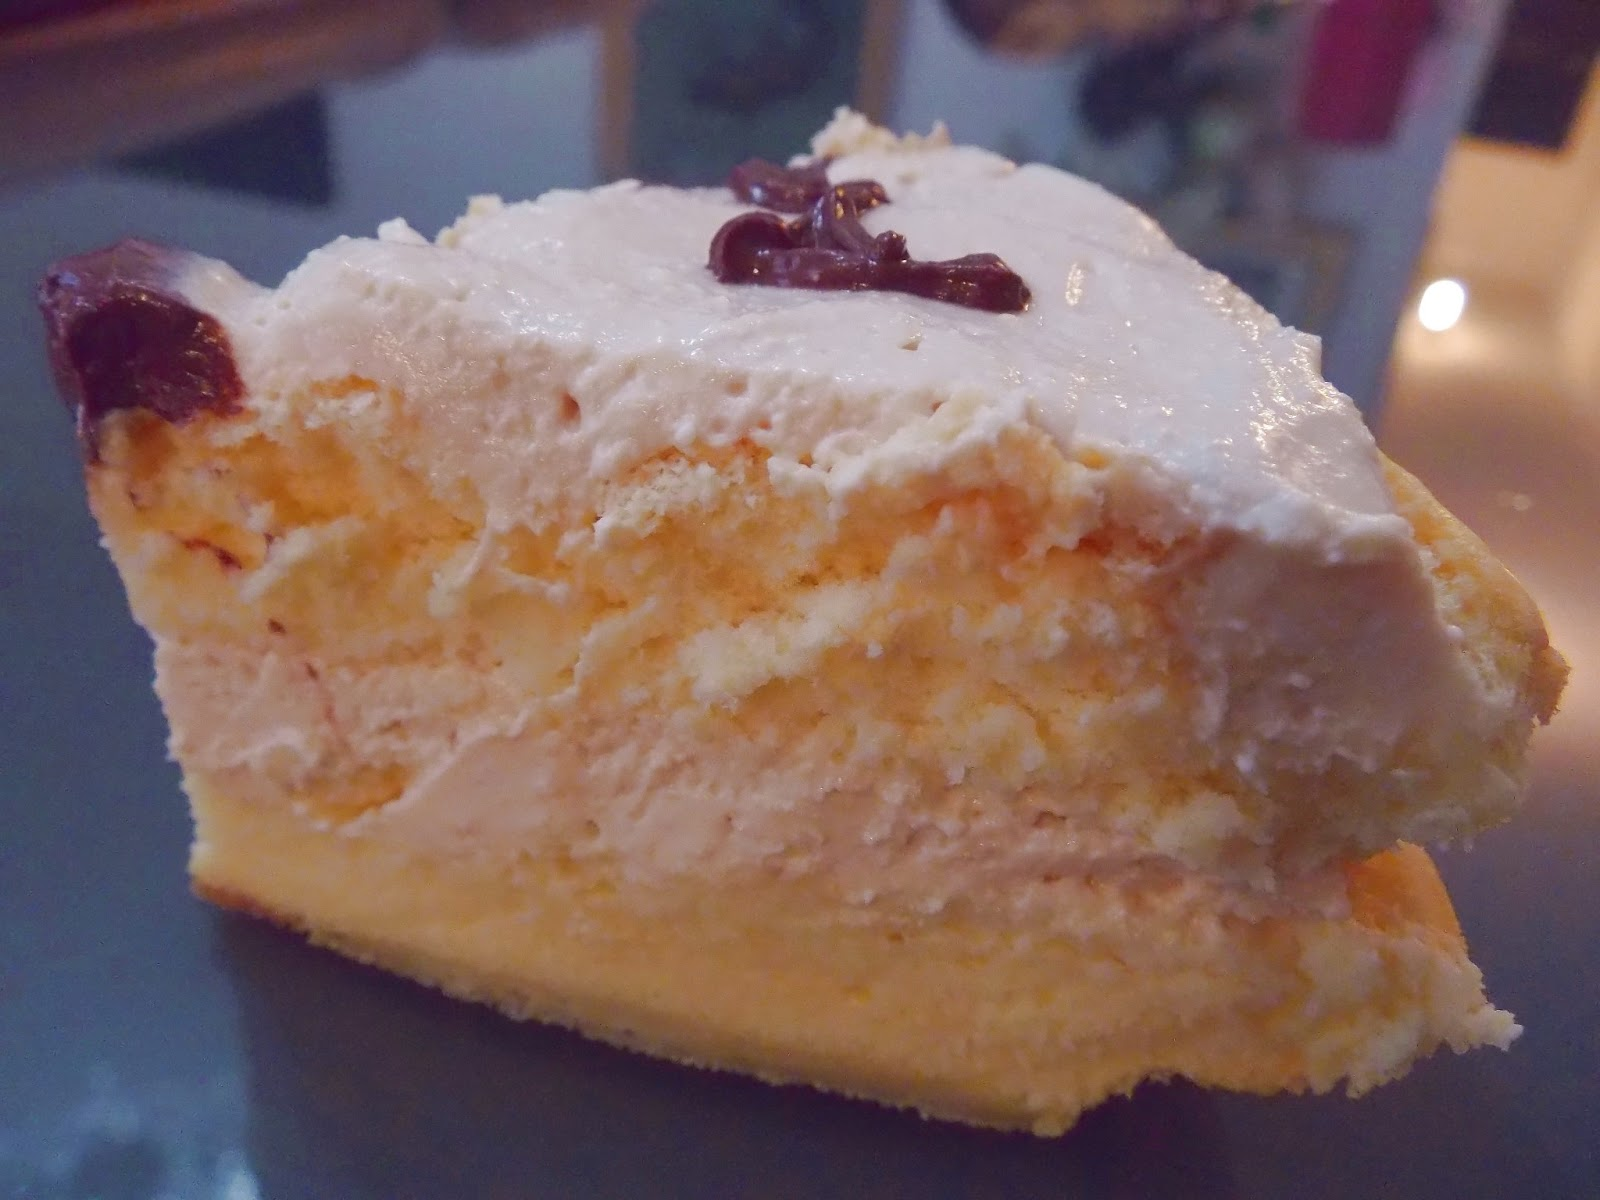 Gateau gaga love cakes gateau d 39 anniversaire au caf all g sans sucre sans gras sans gluten - Gateau d anniversaire sans gluten ...